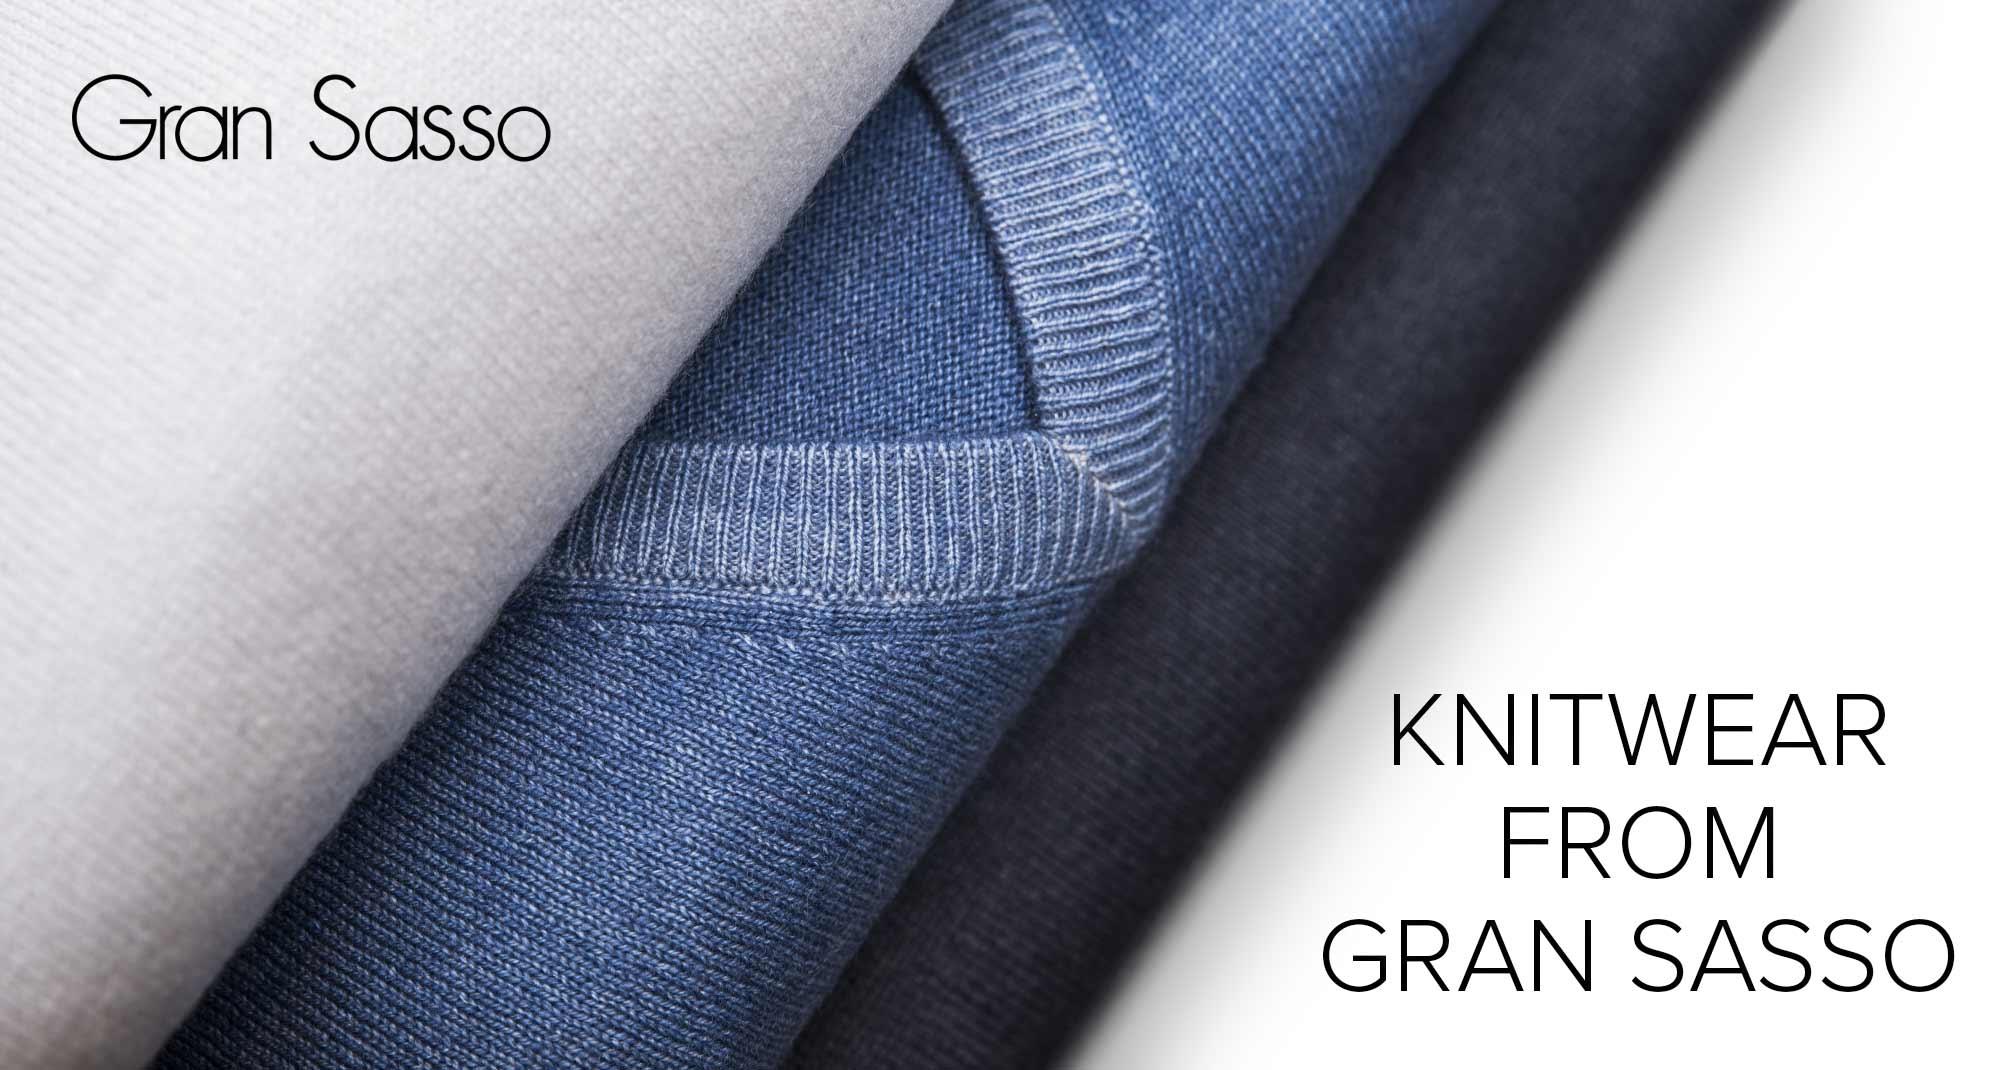 Gran Sasso Knitwear